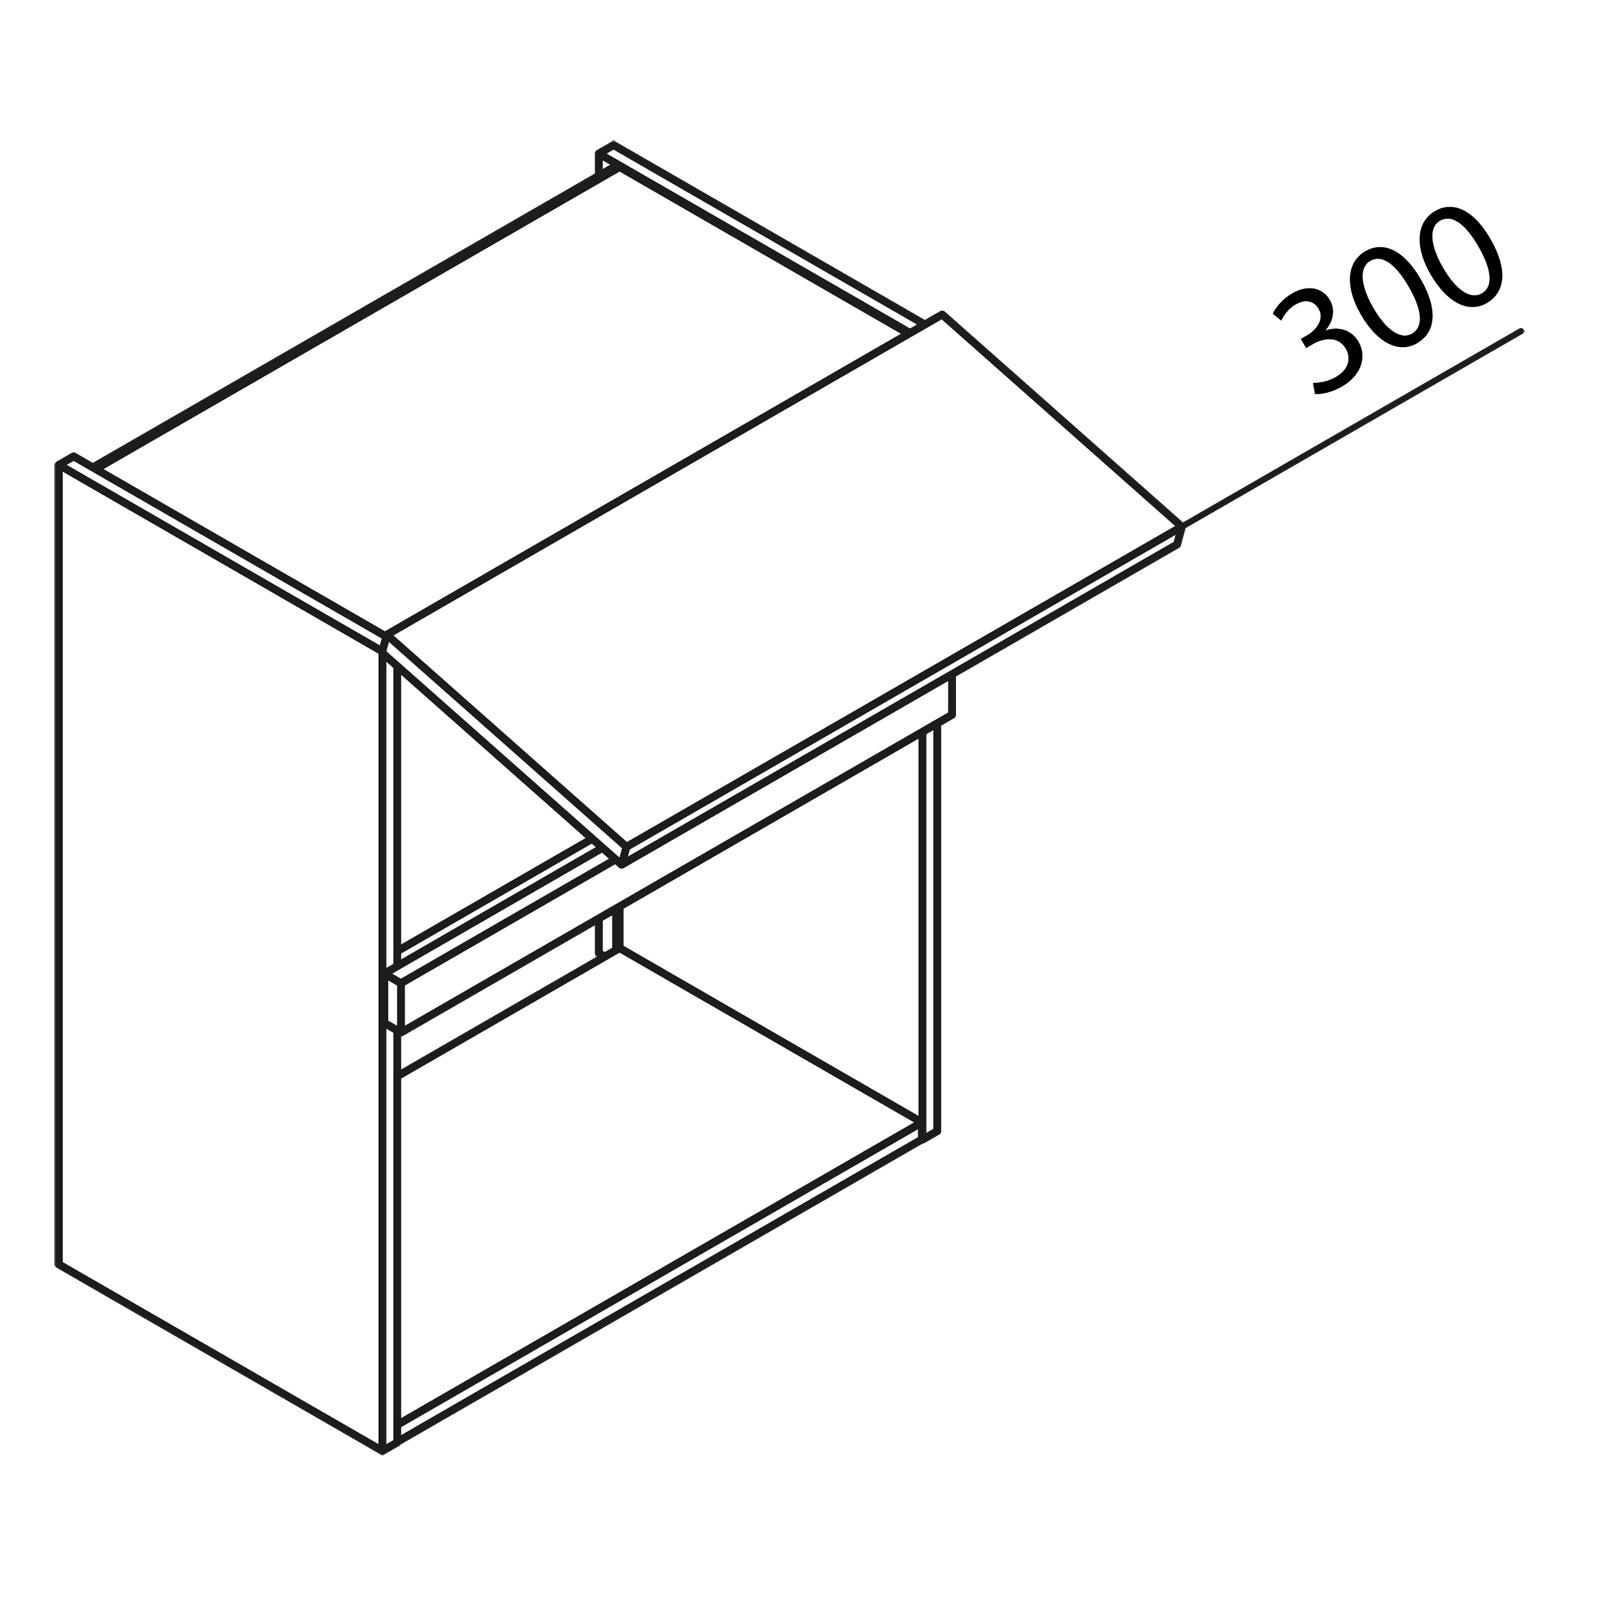 nolte k chen h ngeschrank f r mikrowelle hm60 75 399. Black Bedroom Furniture Sets. Home Design Ideas